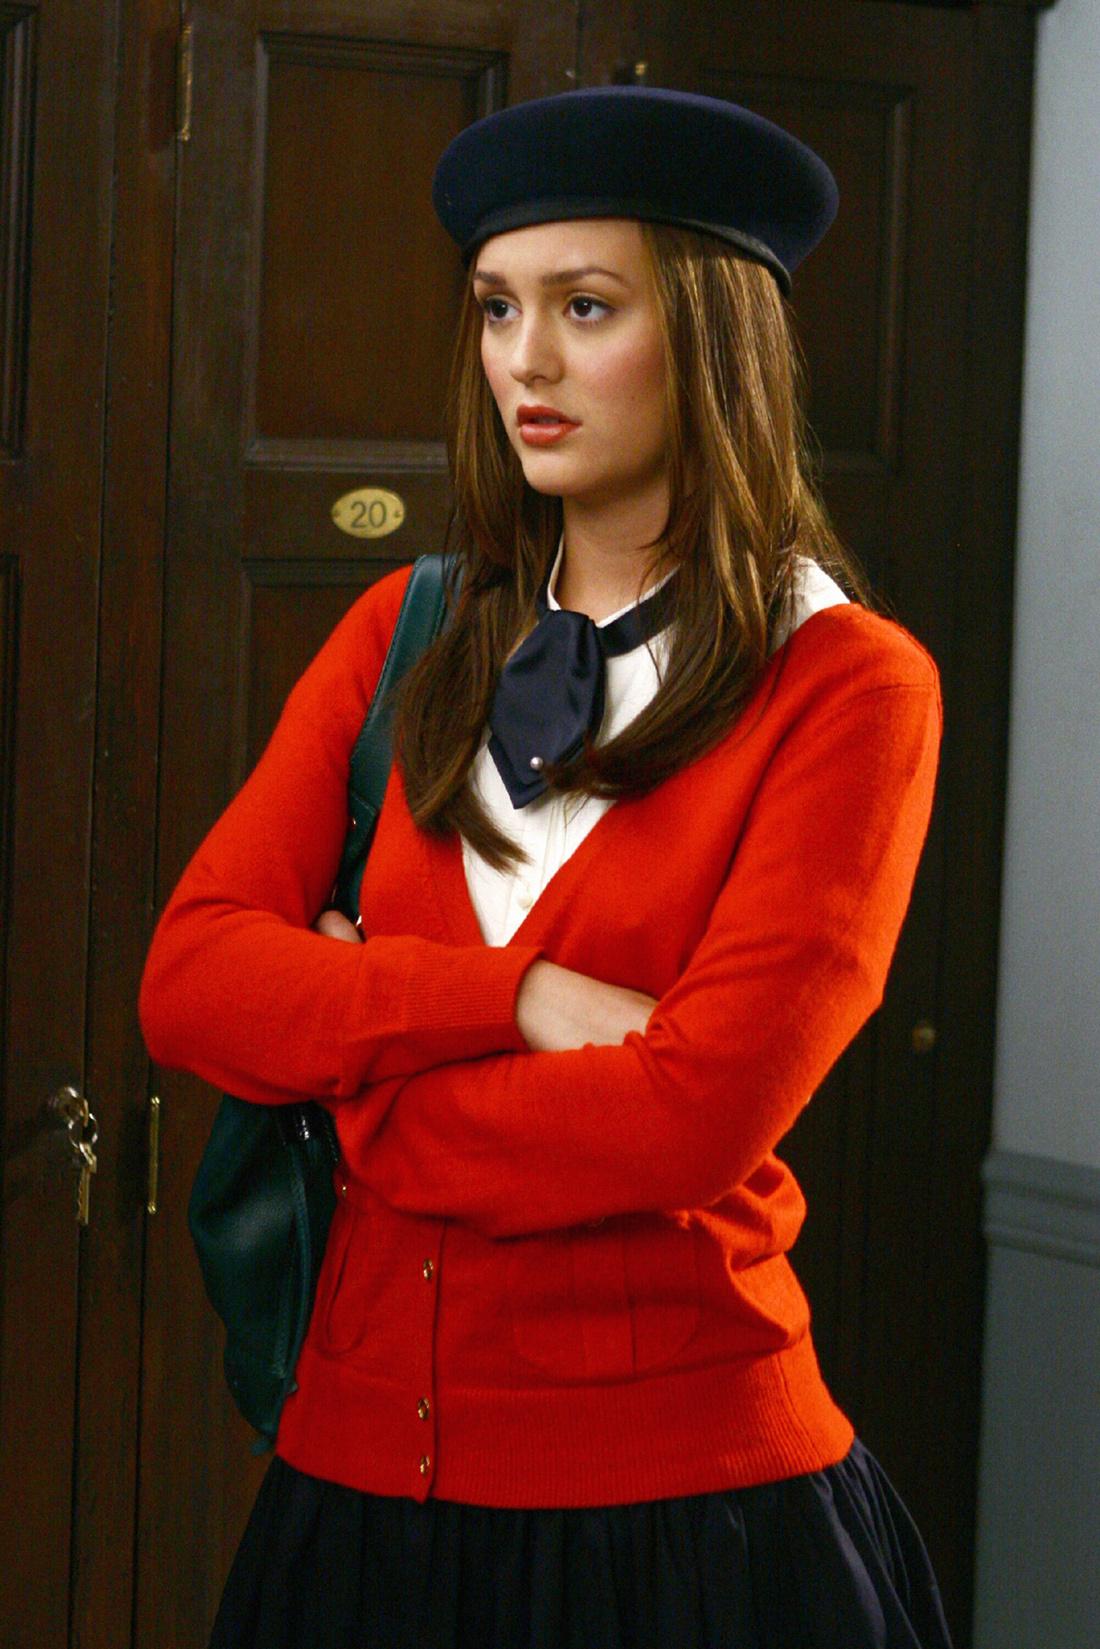 Blair waldorf red dress season 5